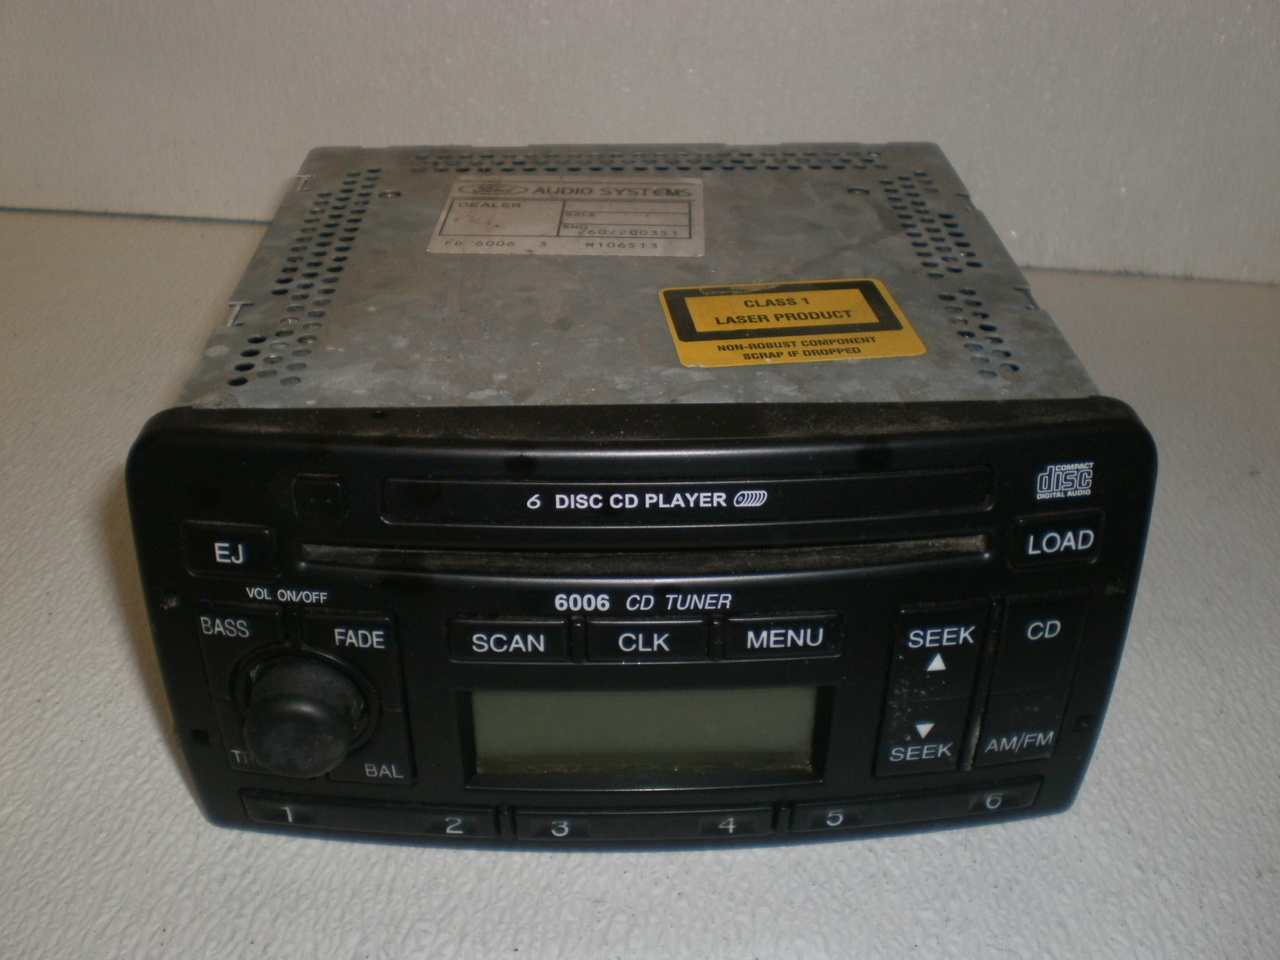 FORD 6006 E RADIO 6 DISC CD PLAYER STEREO FOCUS MONDEO ESCORT FIESTA PUMA 6006E